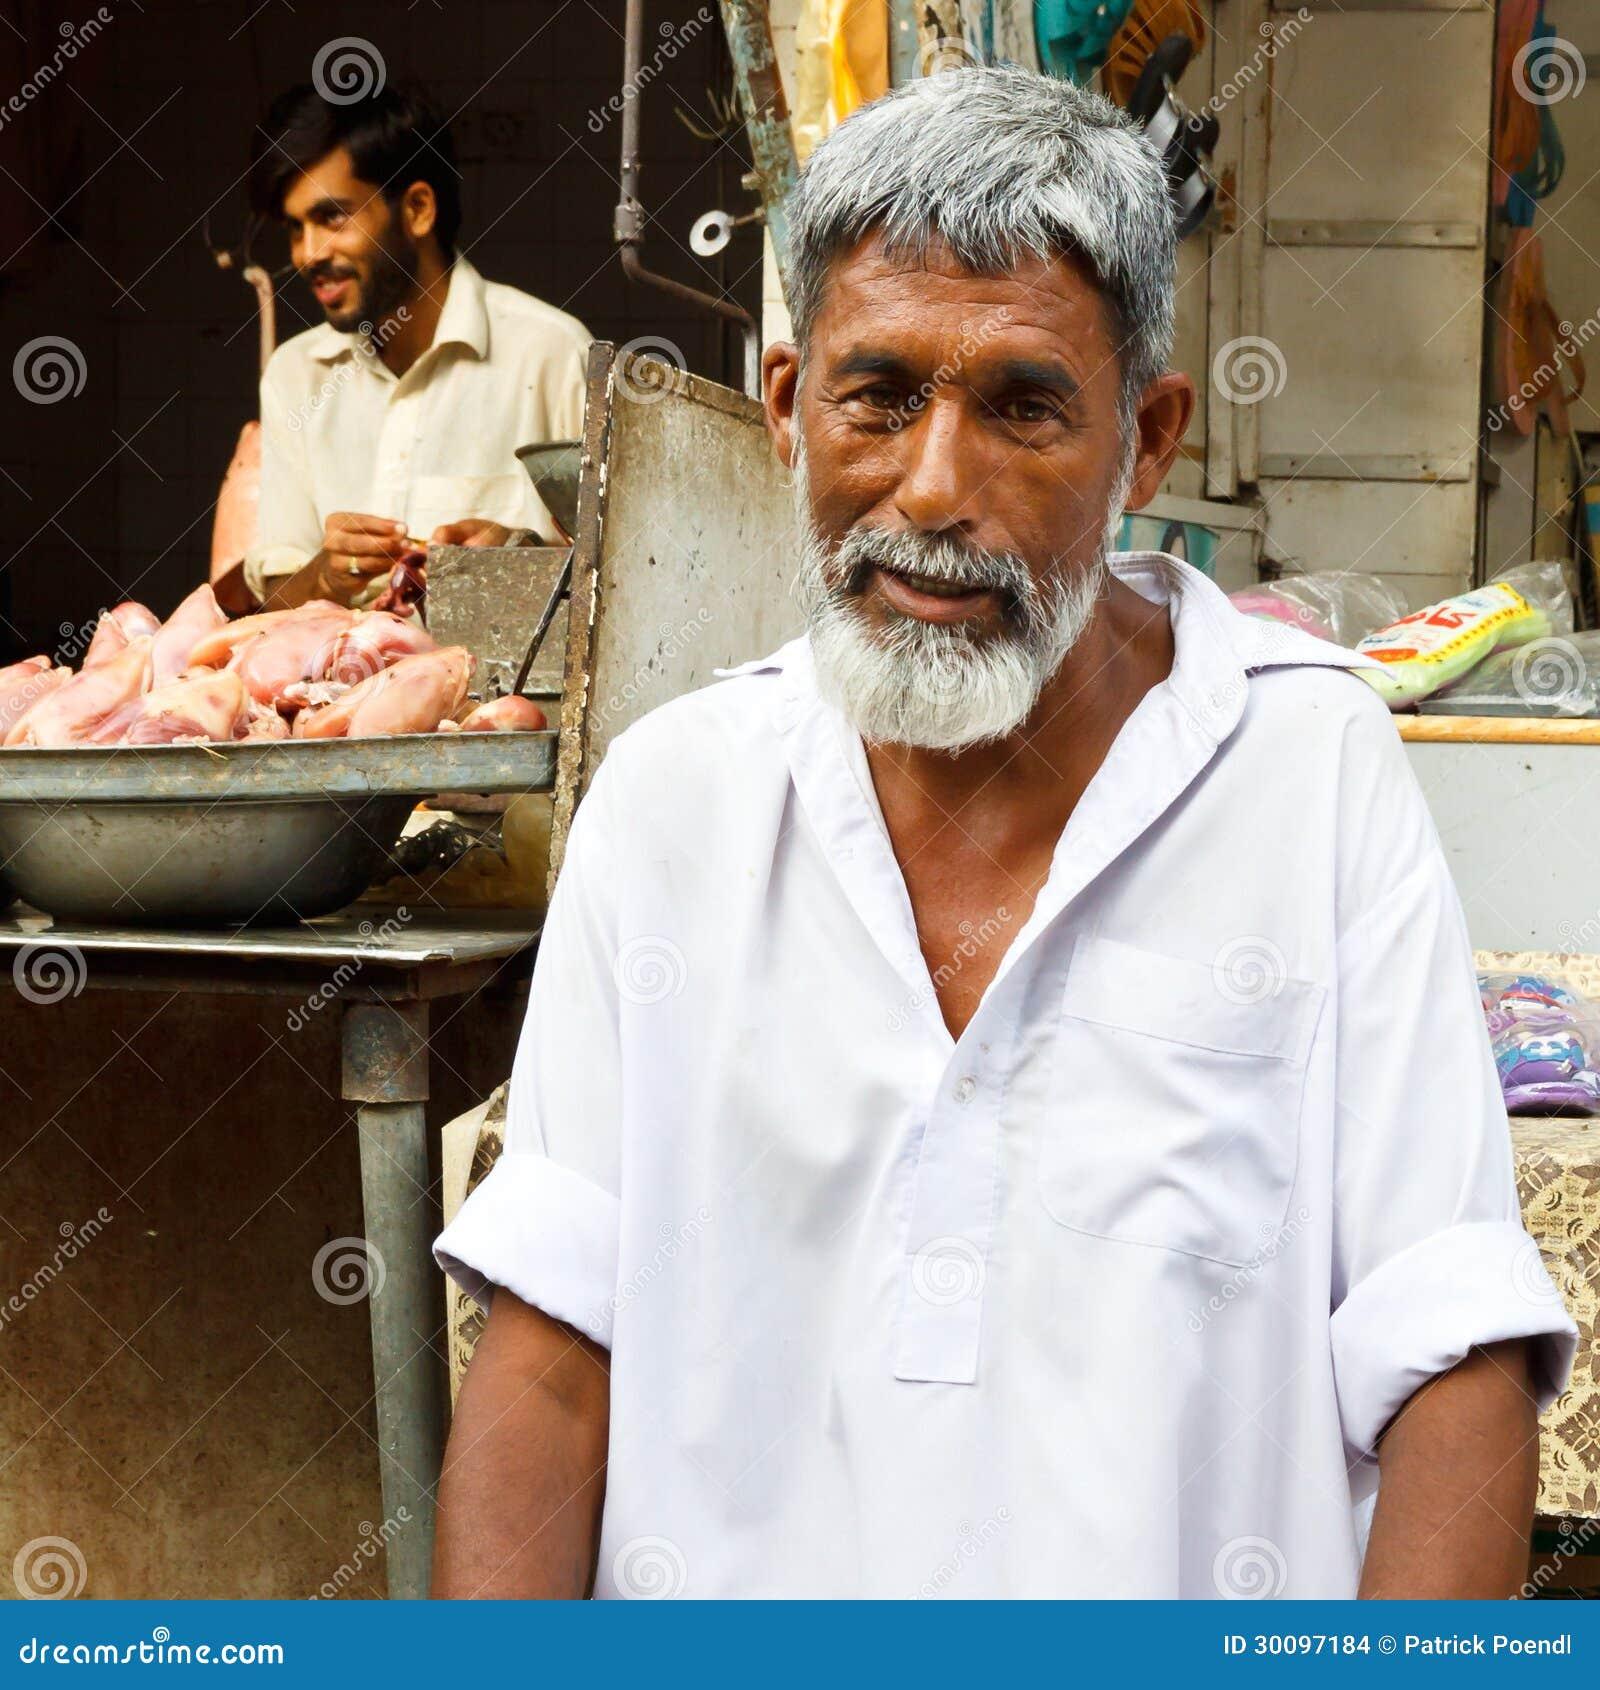 Raja Bazar Rawalpindi: Raja Bazaar In Rawalpindi, Pakistan Editorial Stock Image